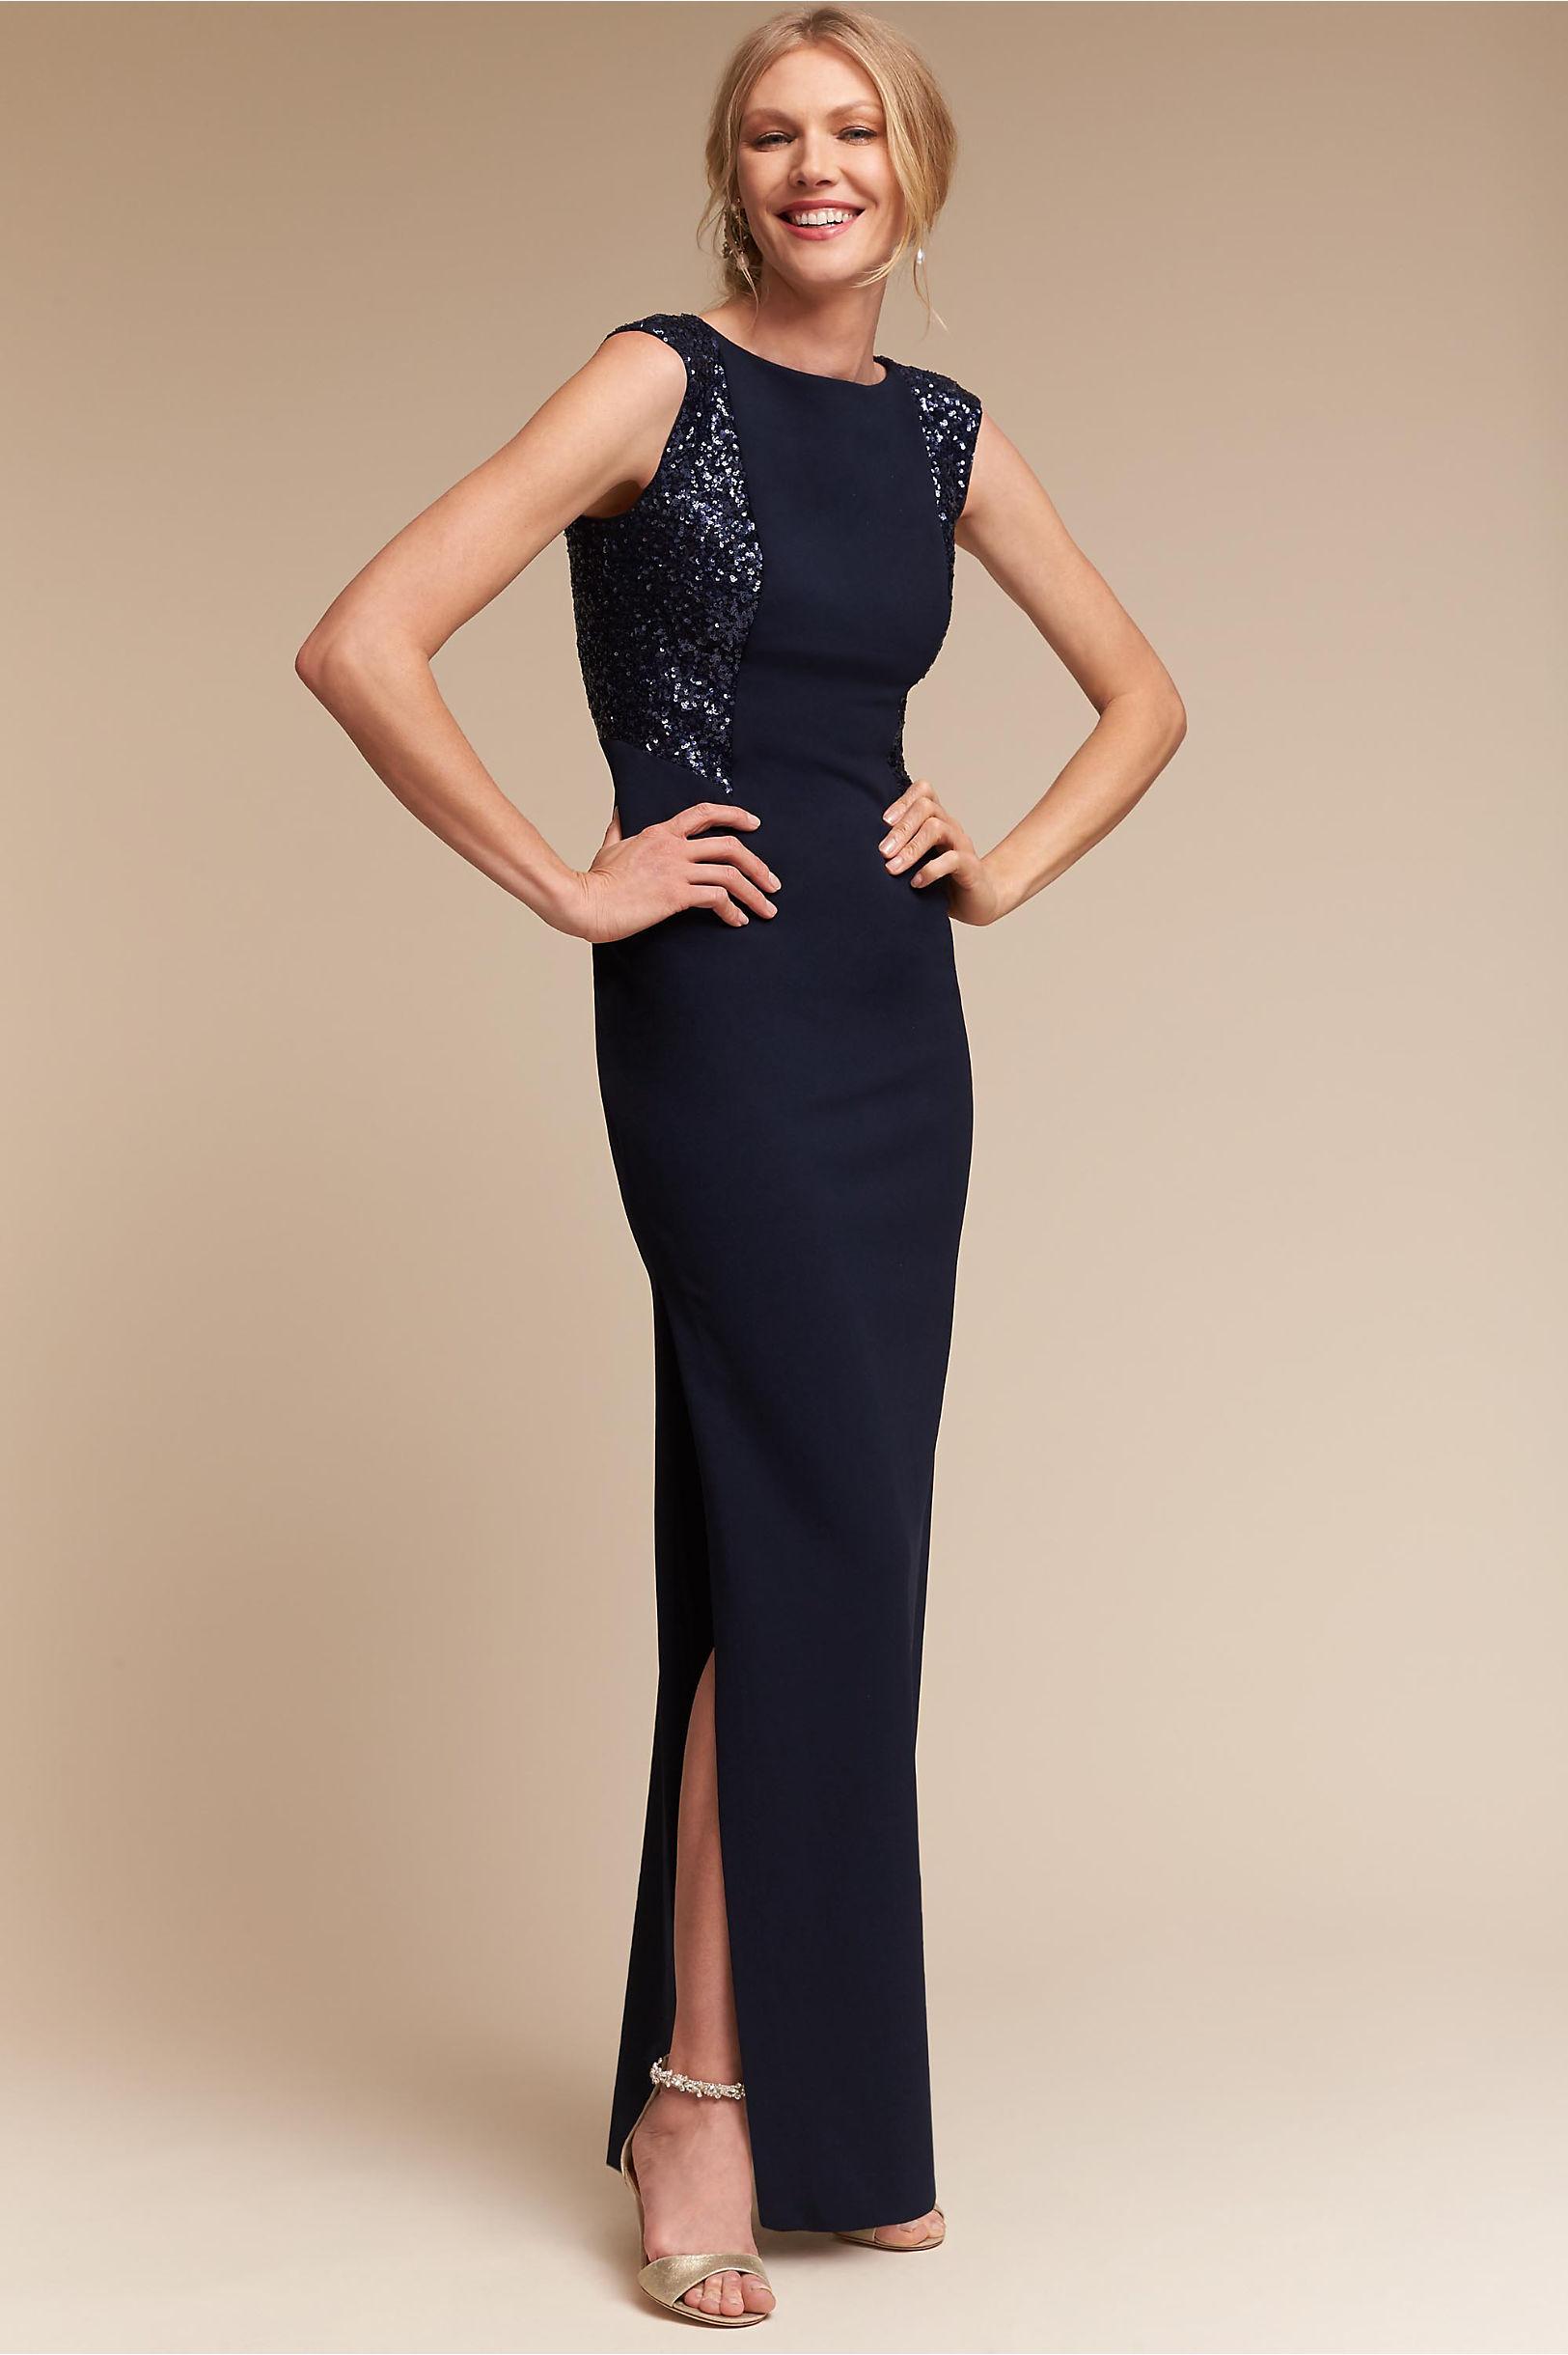 Metropolitan Dress in Sale | BHLDN